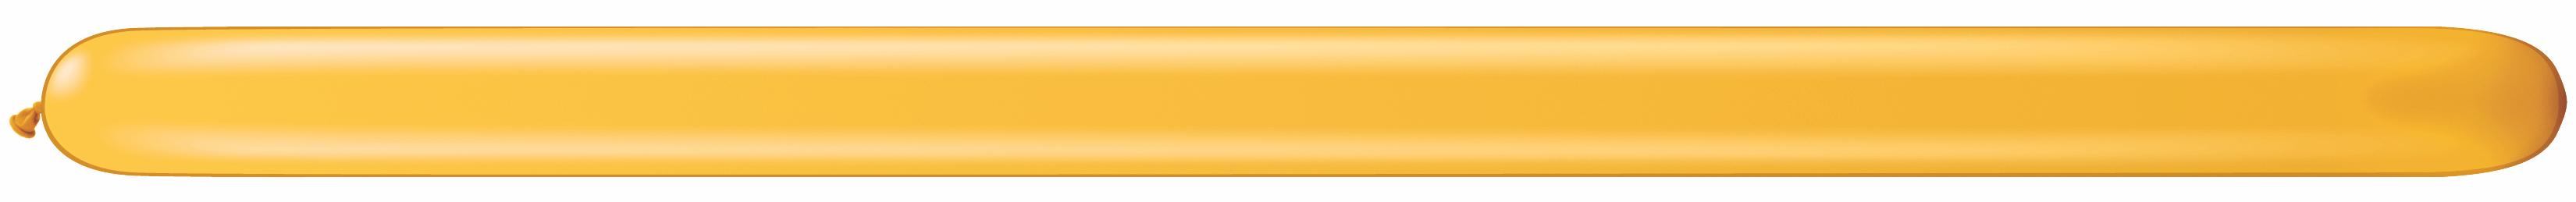 350Q Latex Balloons (100 Count) Goldenrod